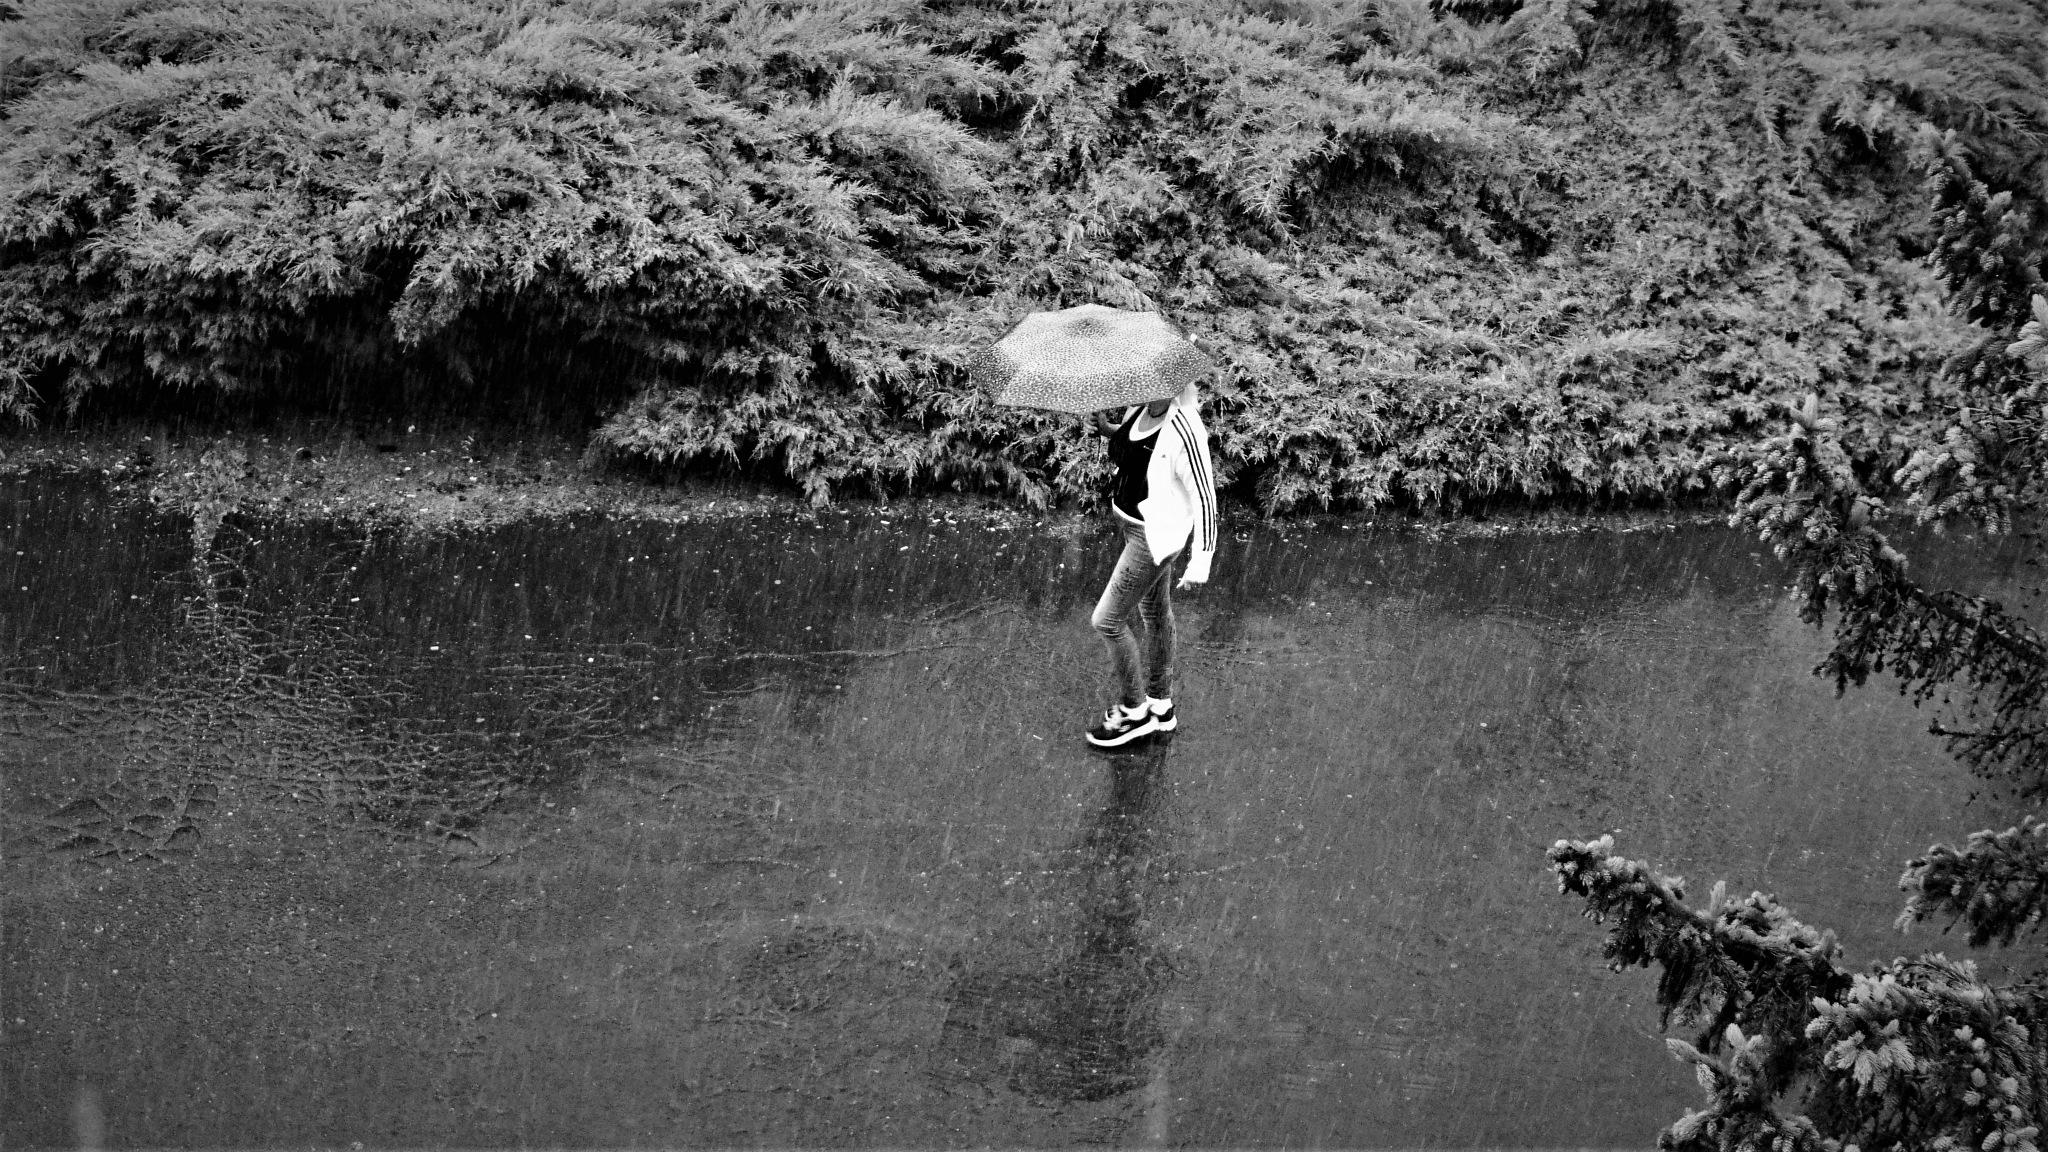 Woman in the rain  by  robert pojedinec robert